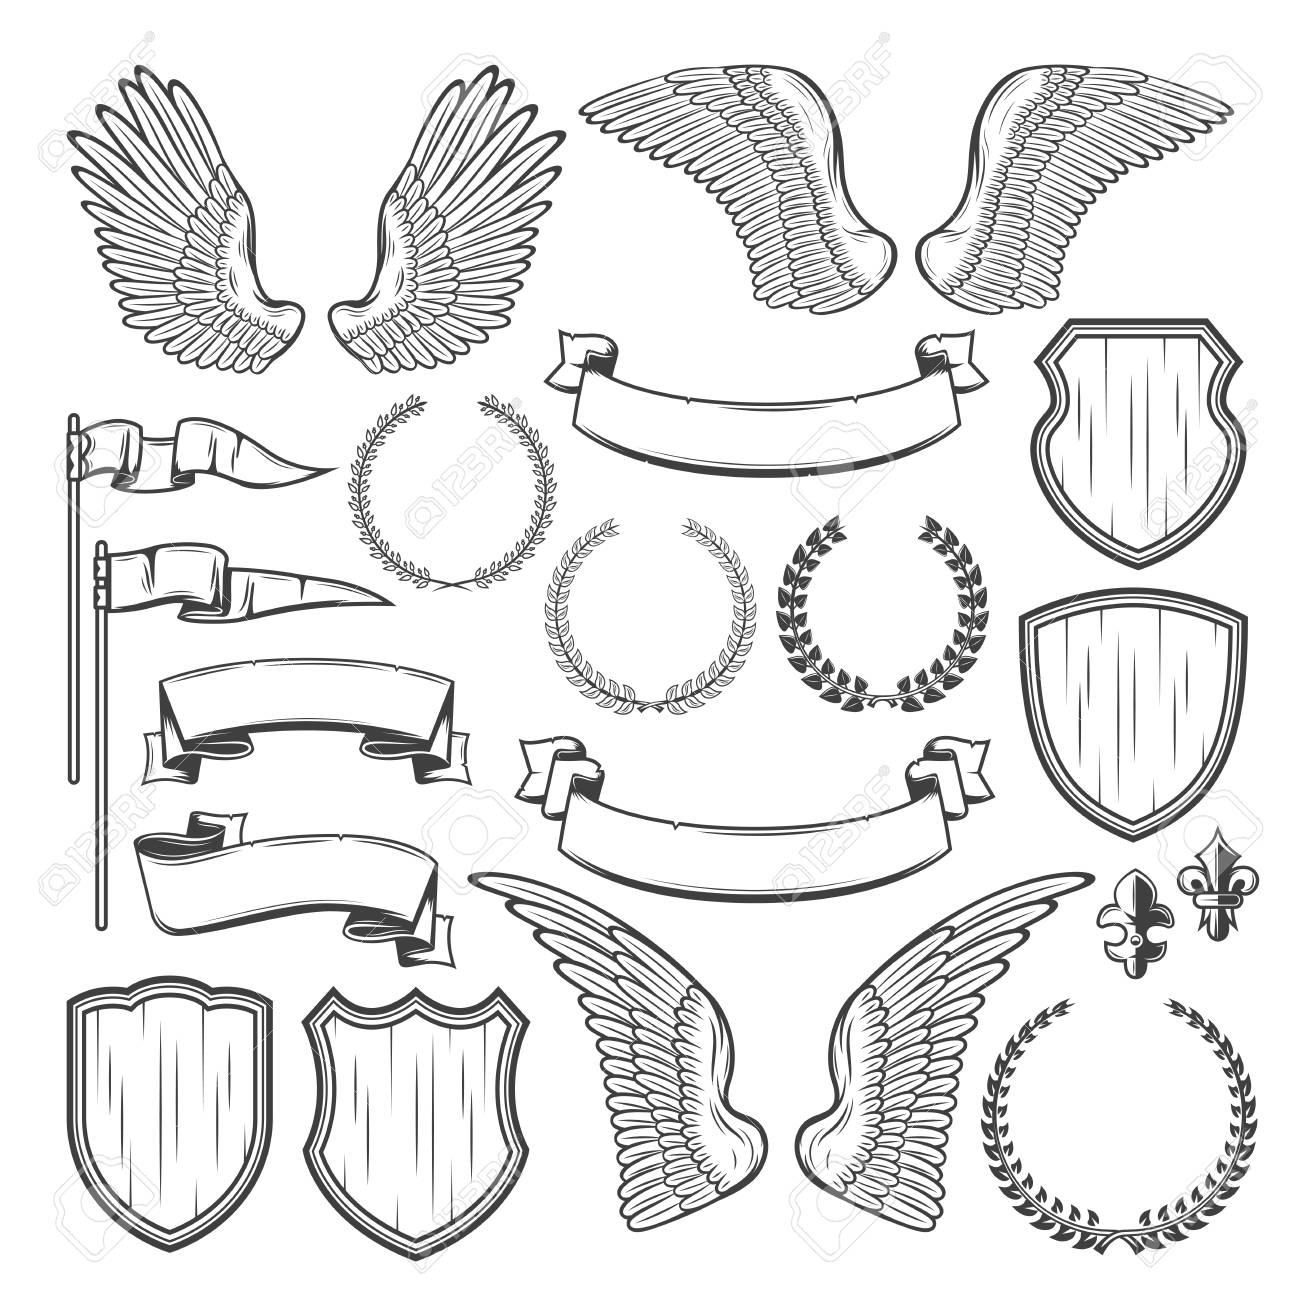 Heraldic Element For Medieval Badge And Royal Crest Design Heraldry Shield Wing Laurel